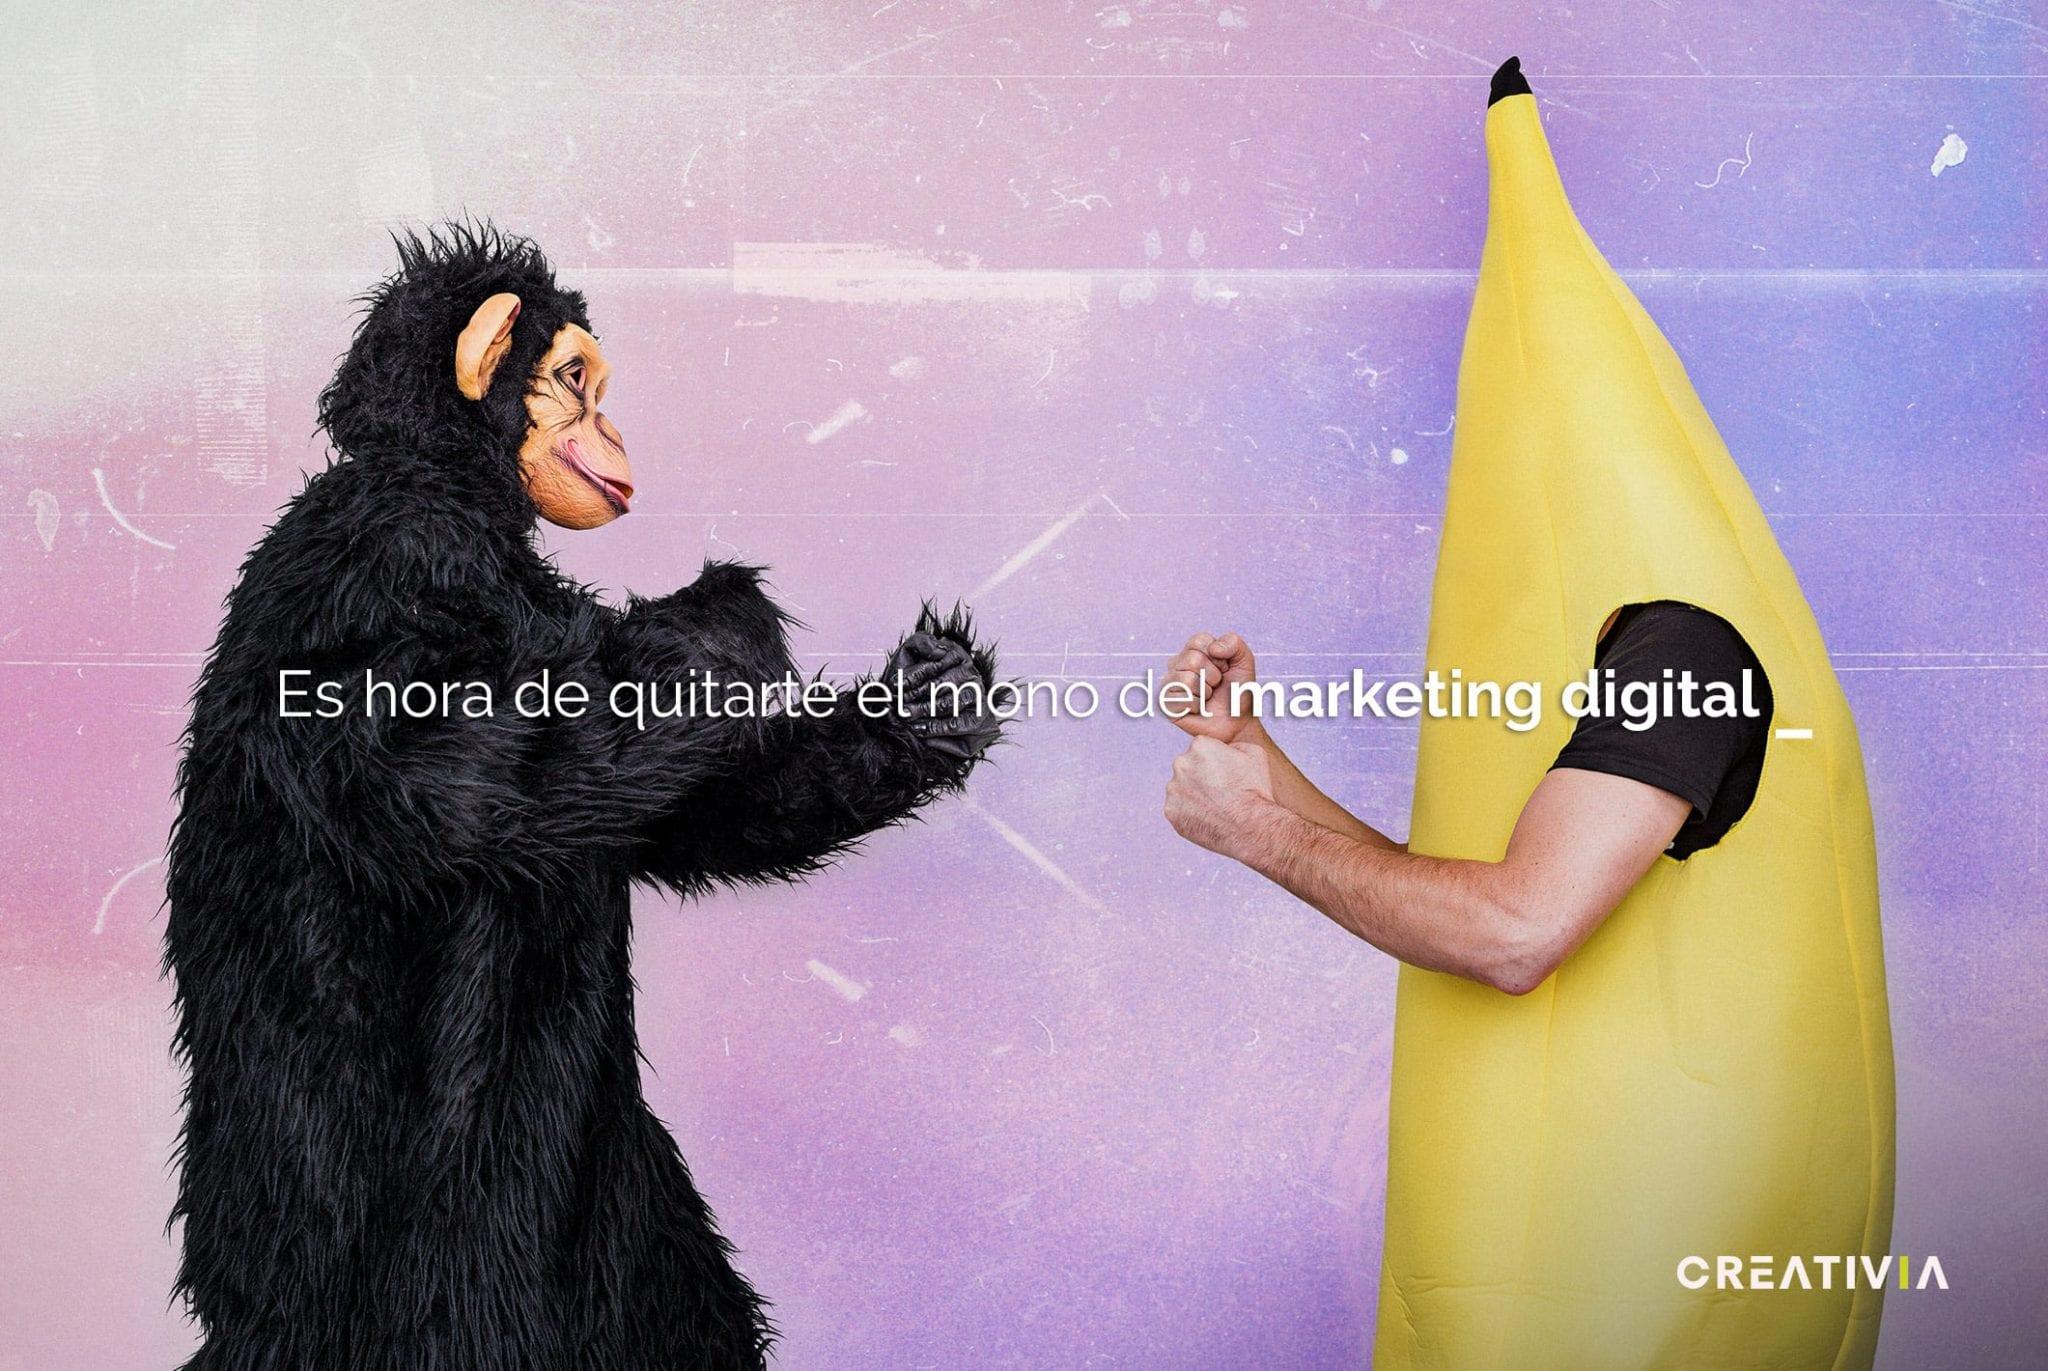 invierte en Marketing Digital- Creativia